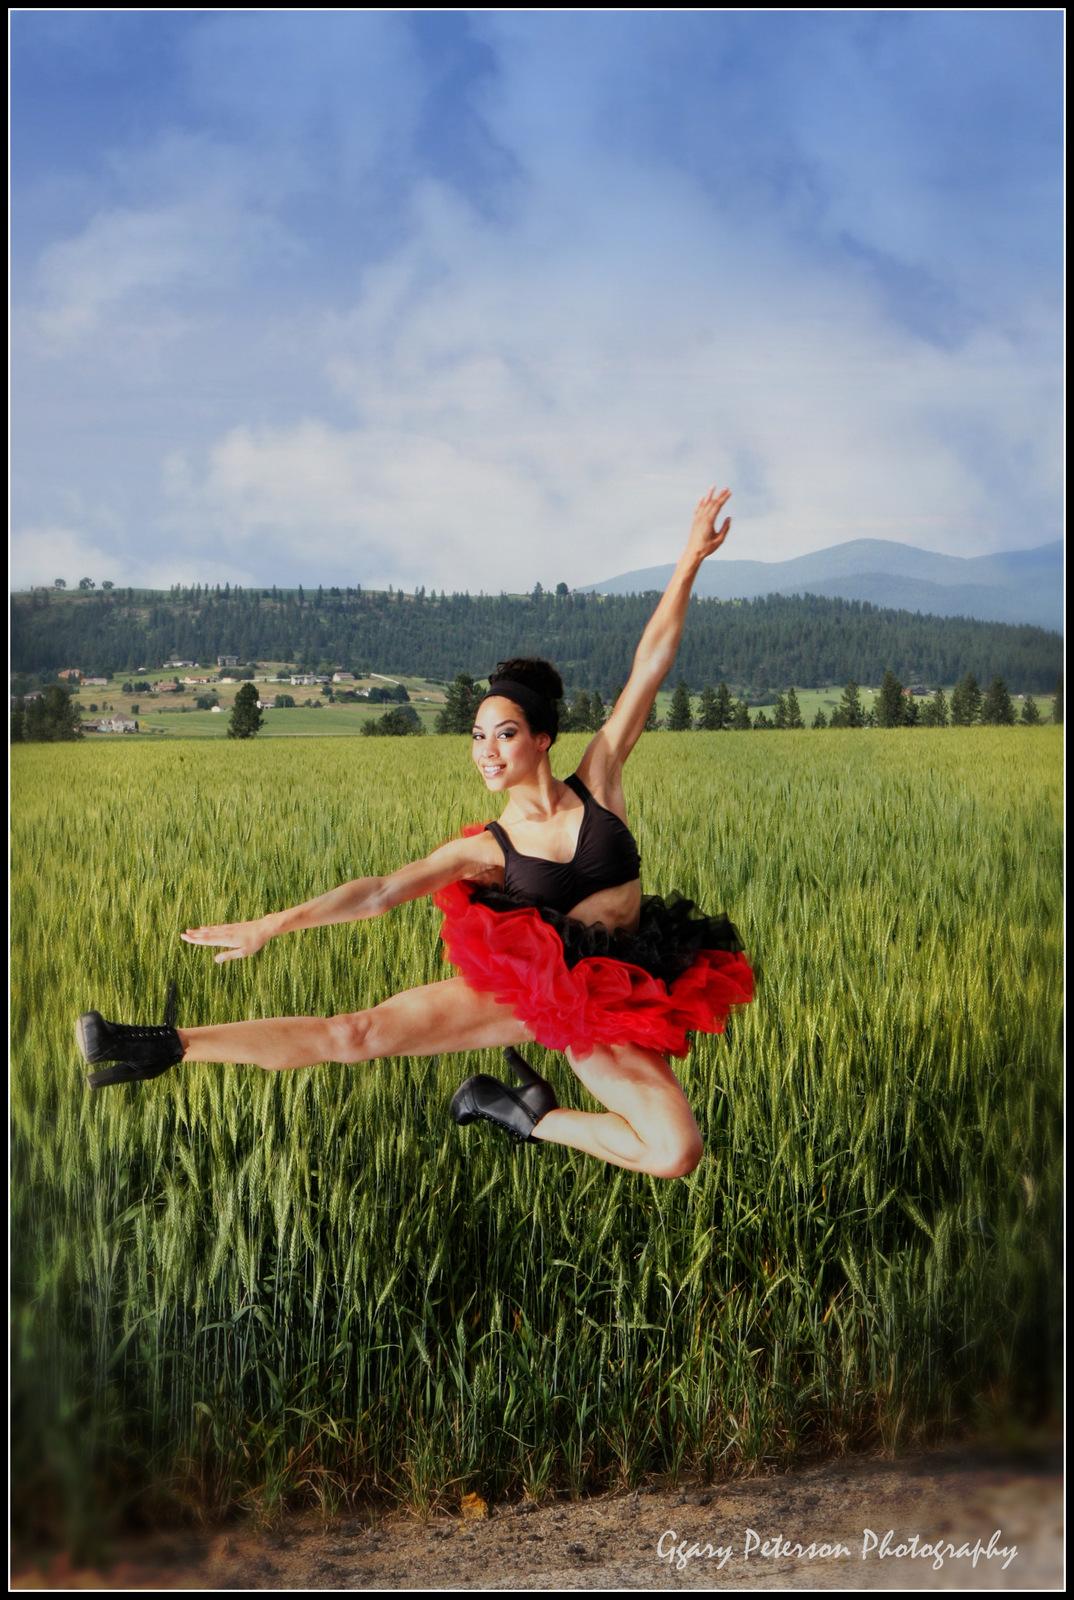 110-1-Leesha Ballet Field .jpg